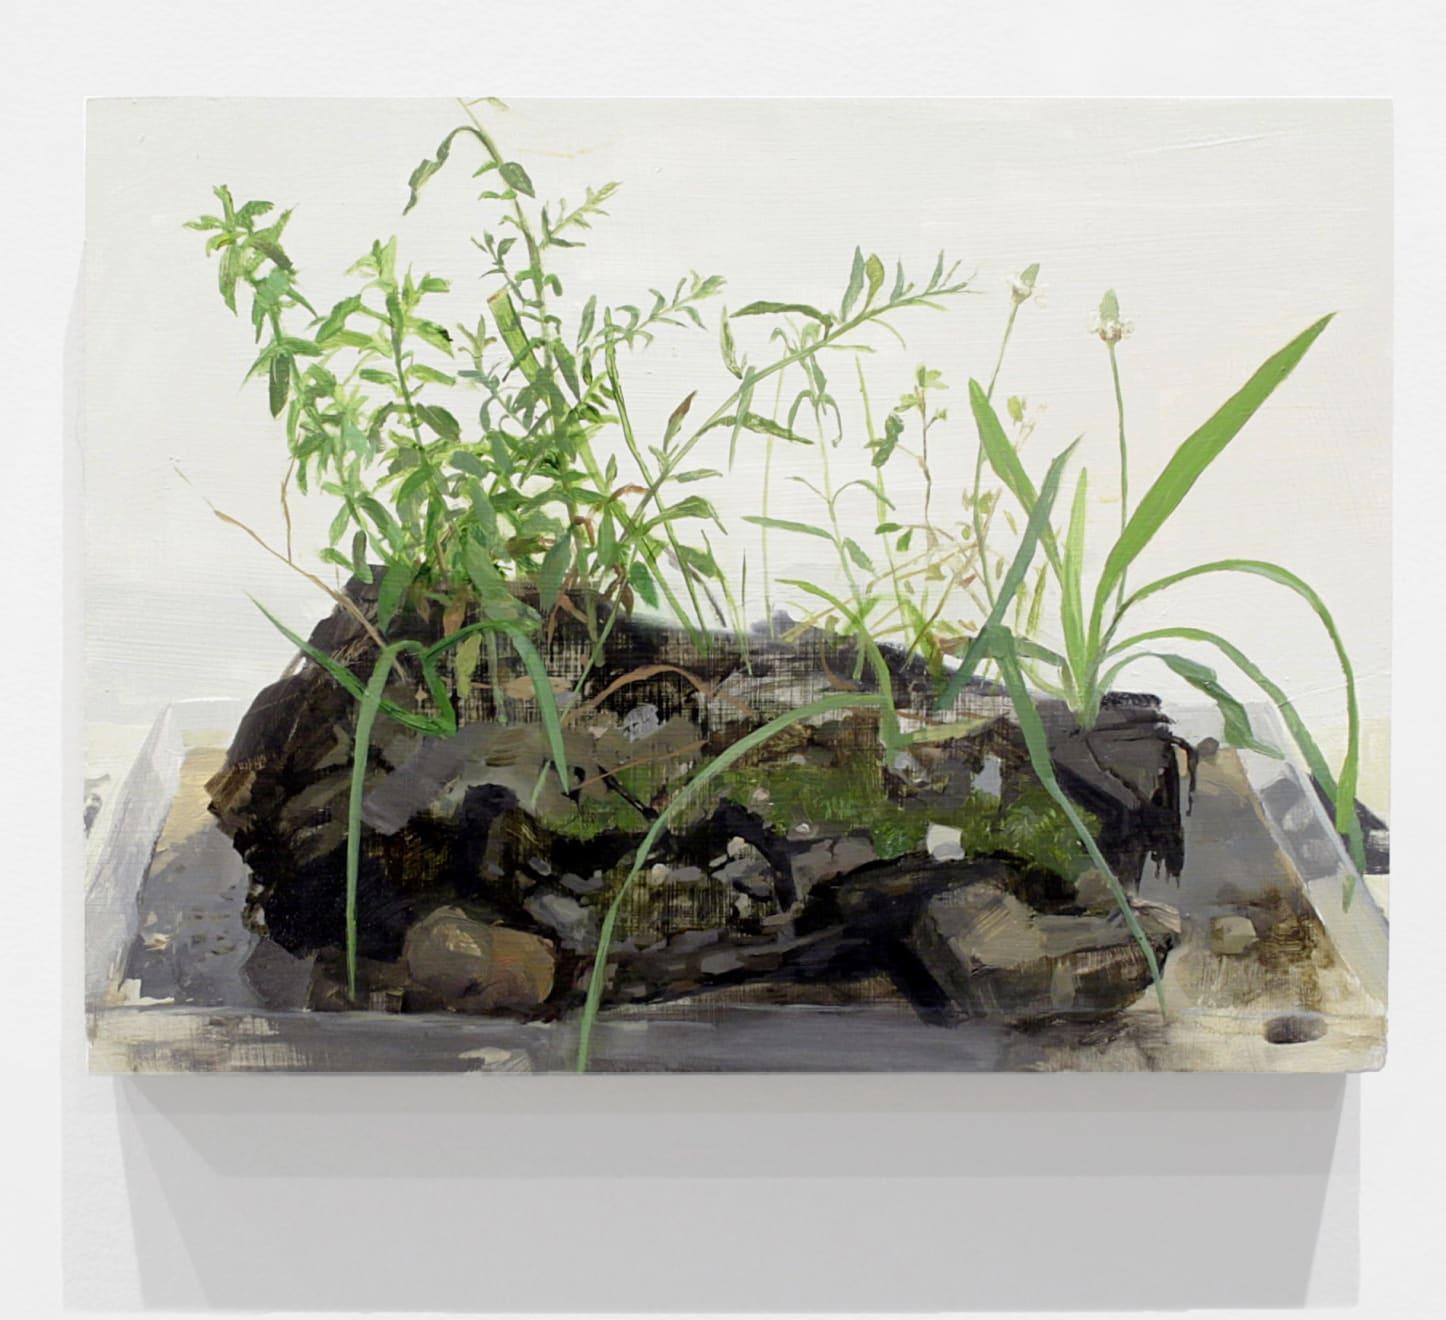 Kristin Musgnug Aster, Bush Clover, English Plantain from Sidewalk Edge, 2017 oil and acrylic on panel 12 x 16 x 1 1/2 in (30.5 x 40.6 x 3.8 cm) KM 235 $3,500